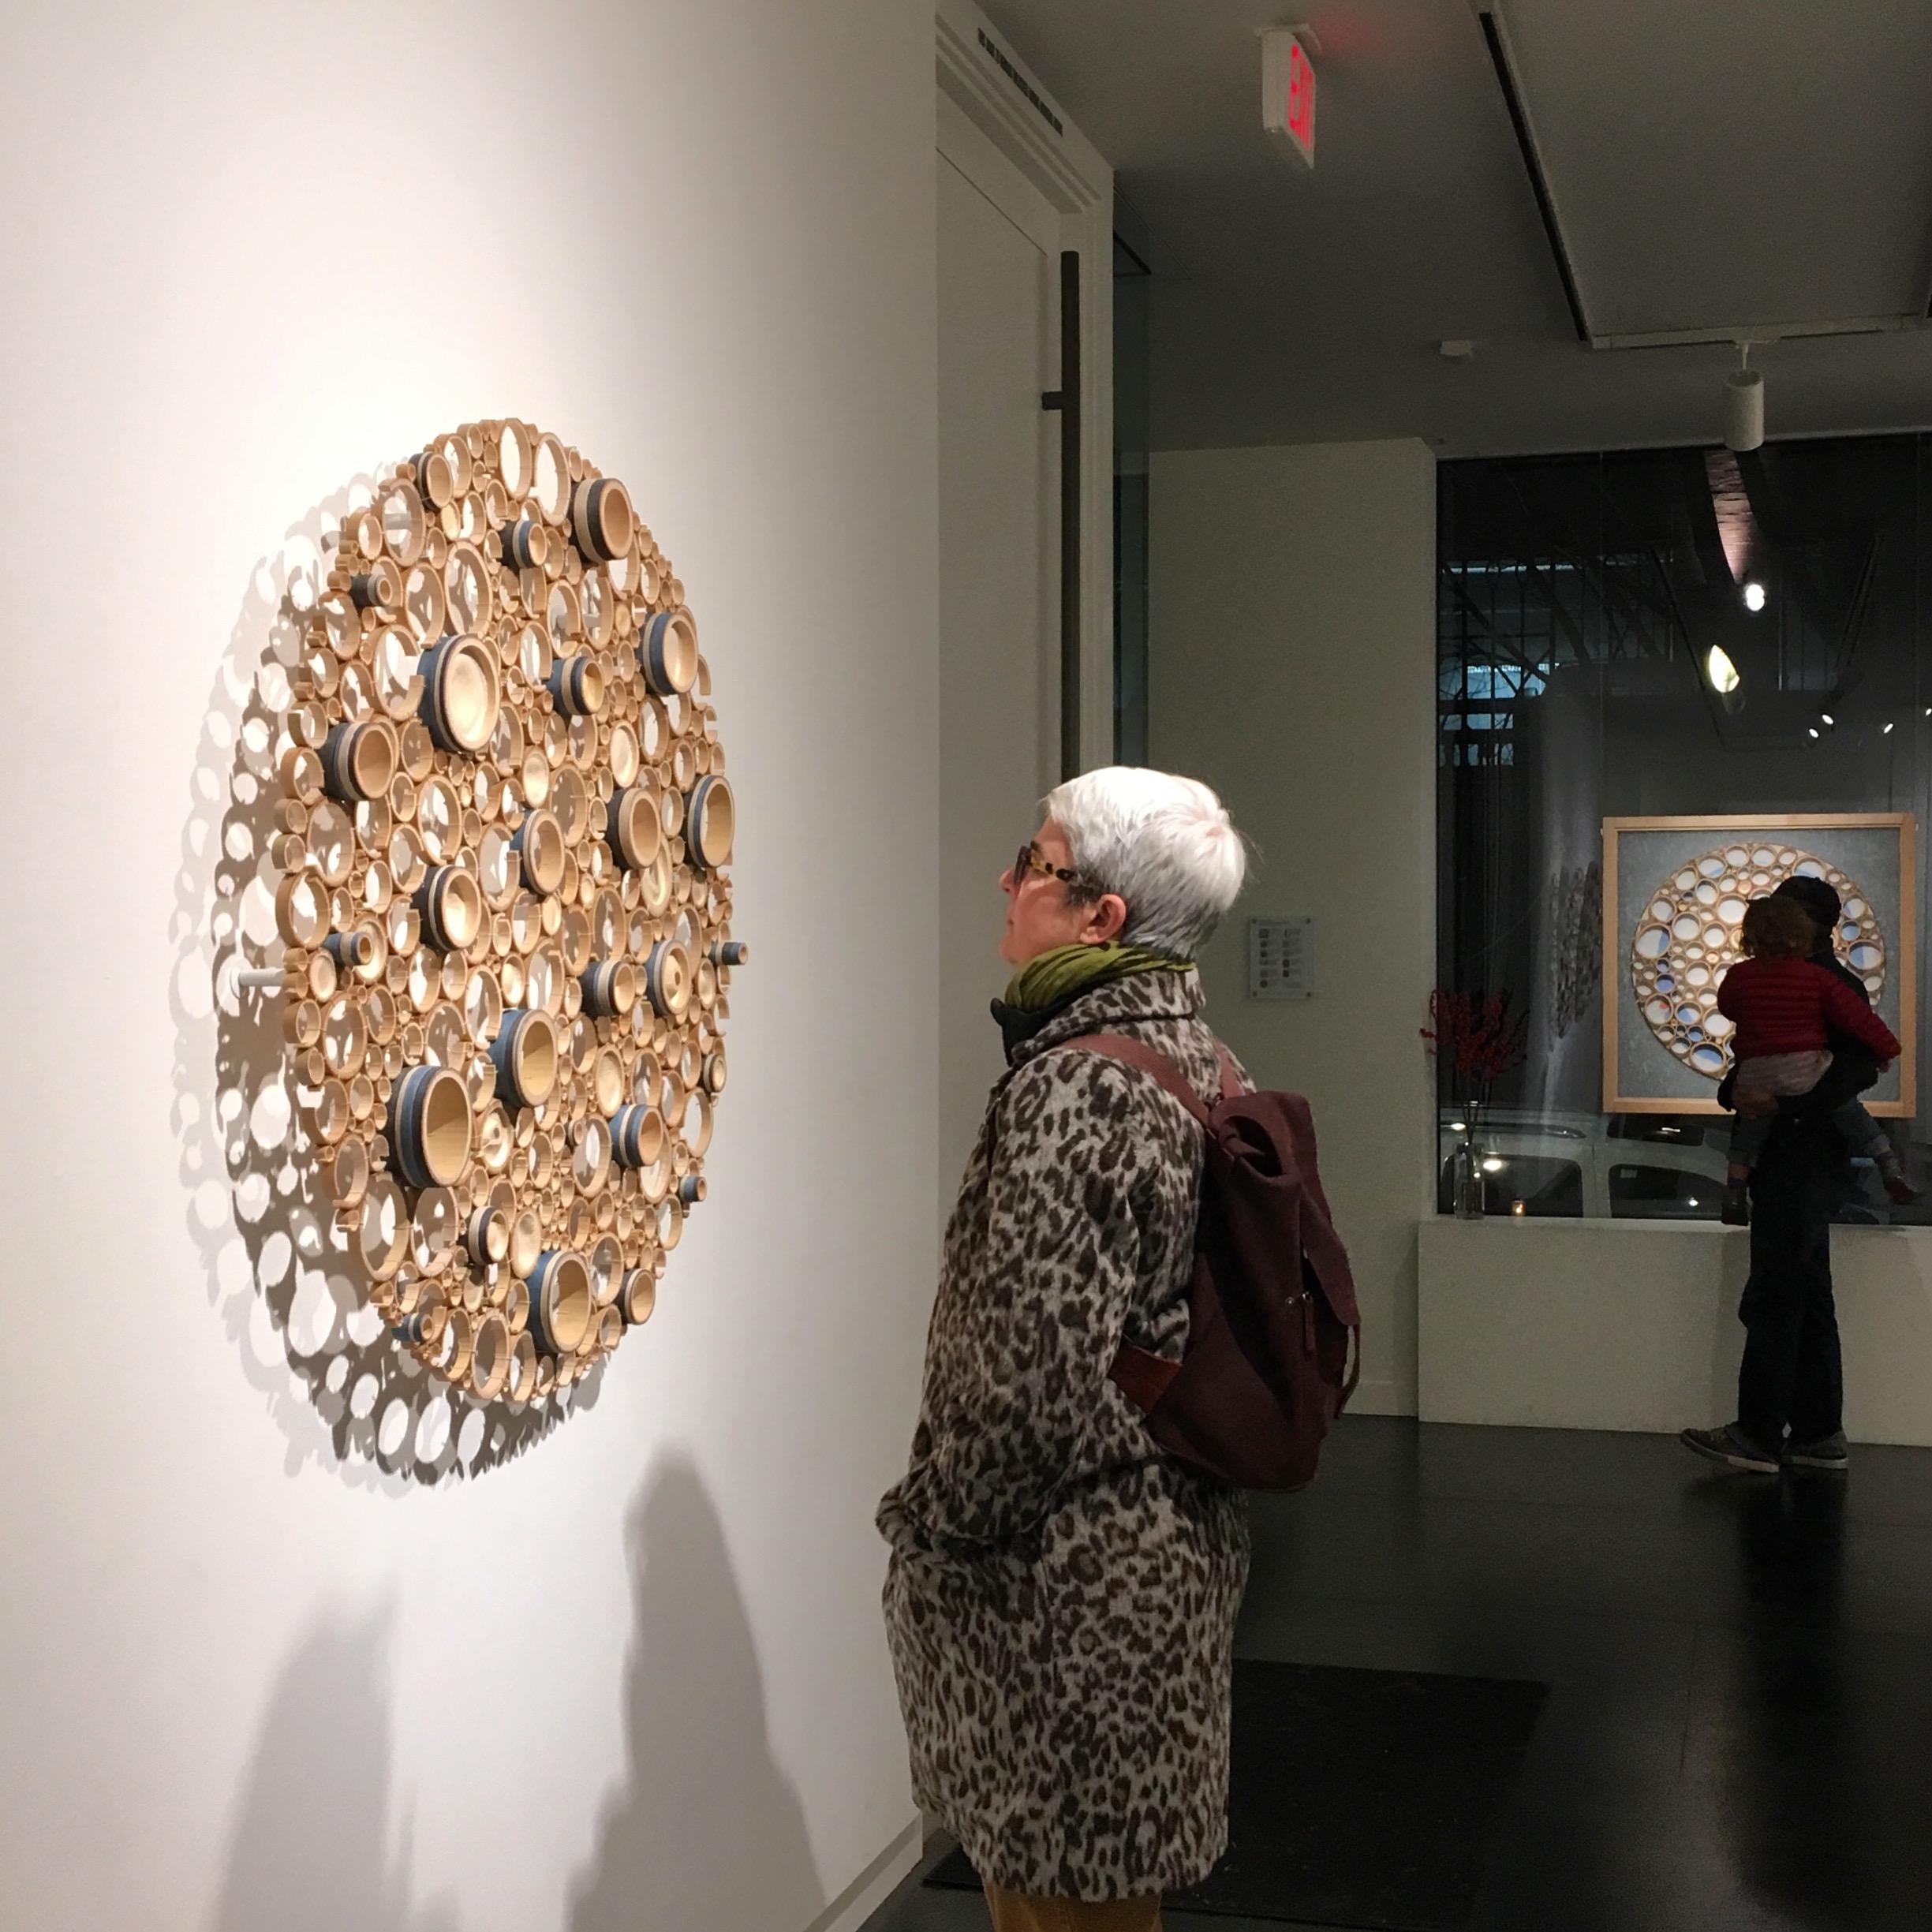 Gallery visitor contemplating a crosscut bamboo sculpture by Anne Crumpacker during the First Thursday art walk.